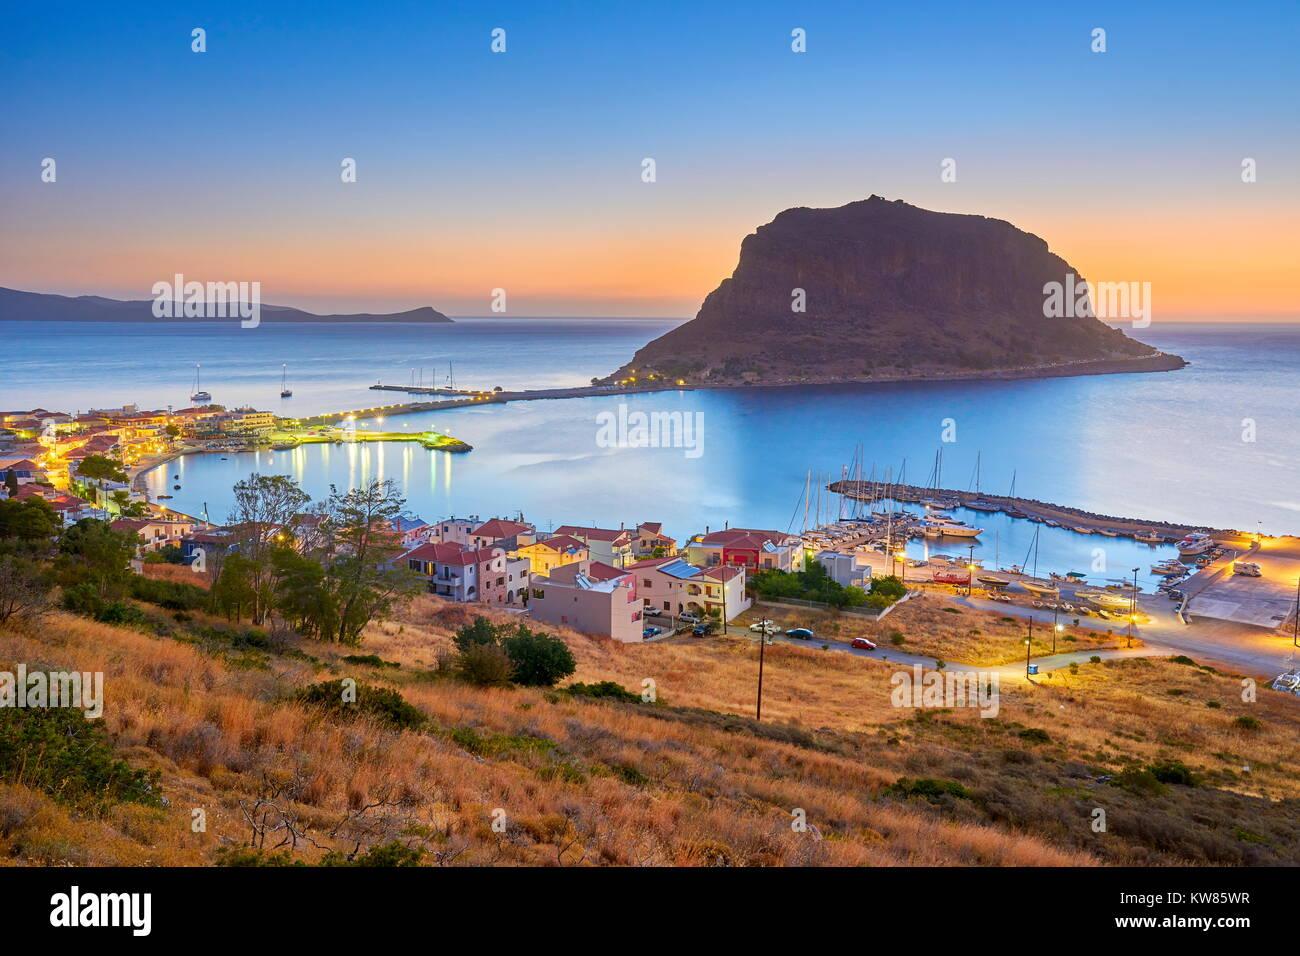 View on Monemvasia before sunrise, Peloponnese, Greece - Stock Image